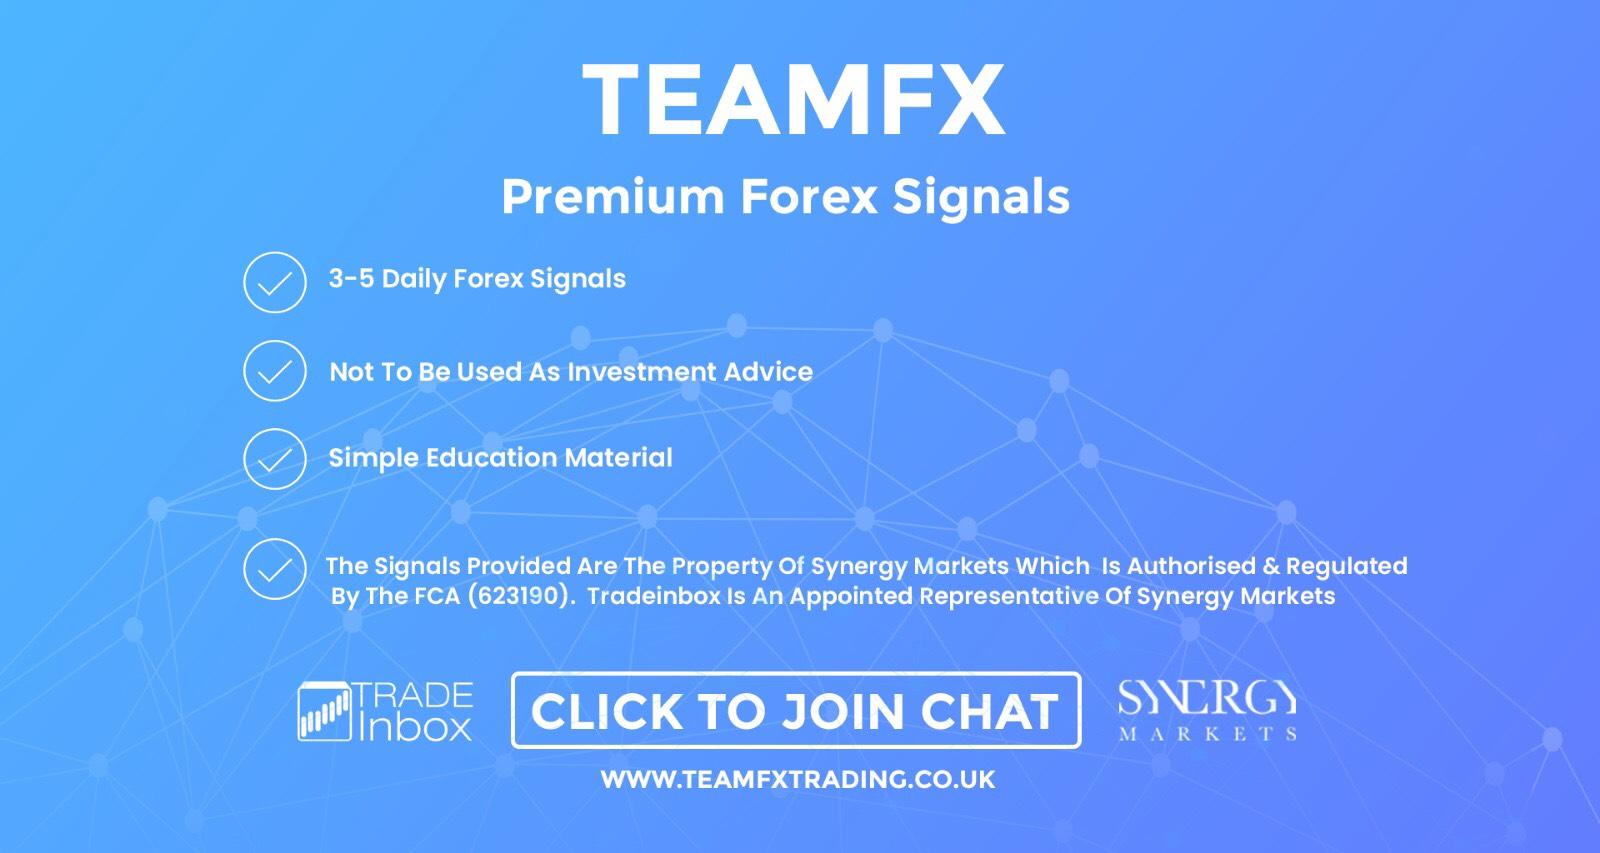 Best premium forex signals